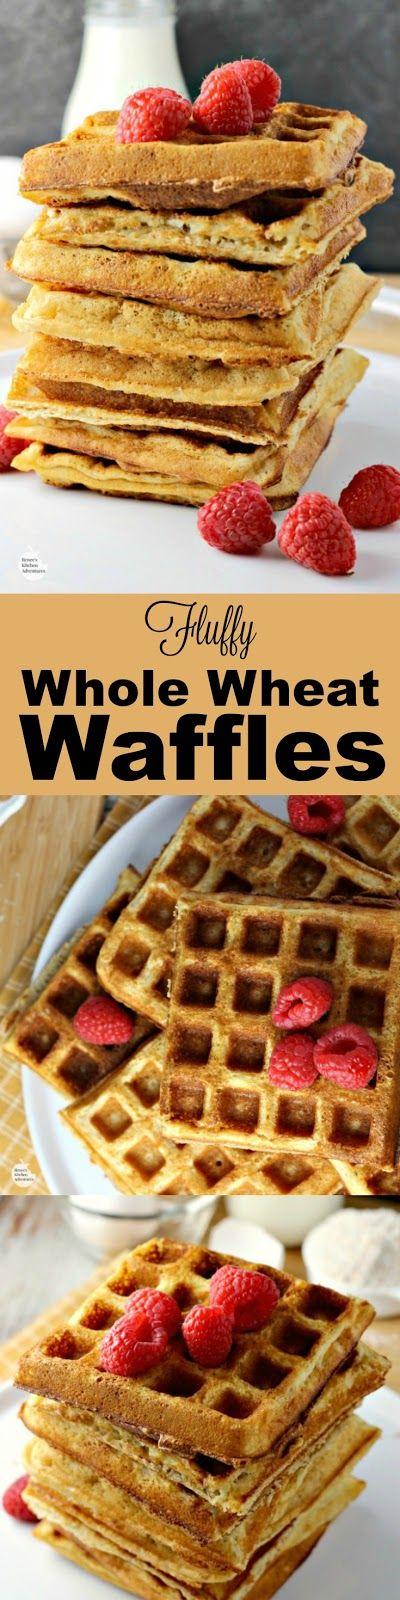 Whole wheat waffles, Waffles and Buttermilk waffles on Pinterest